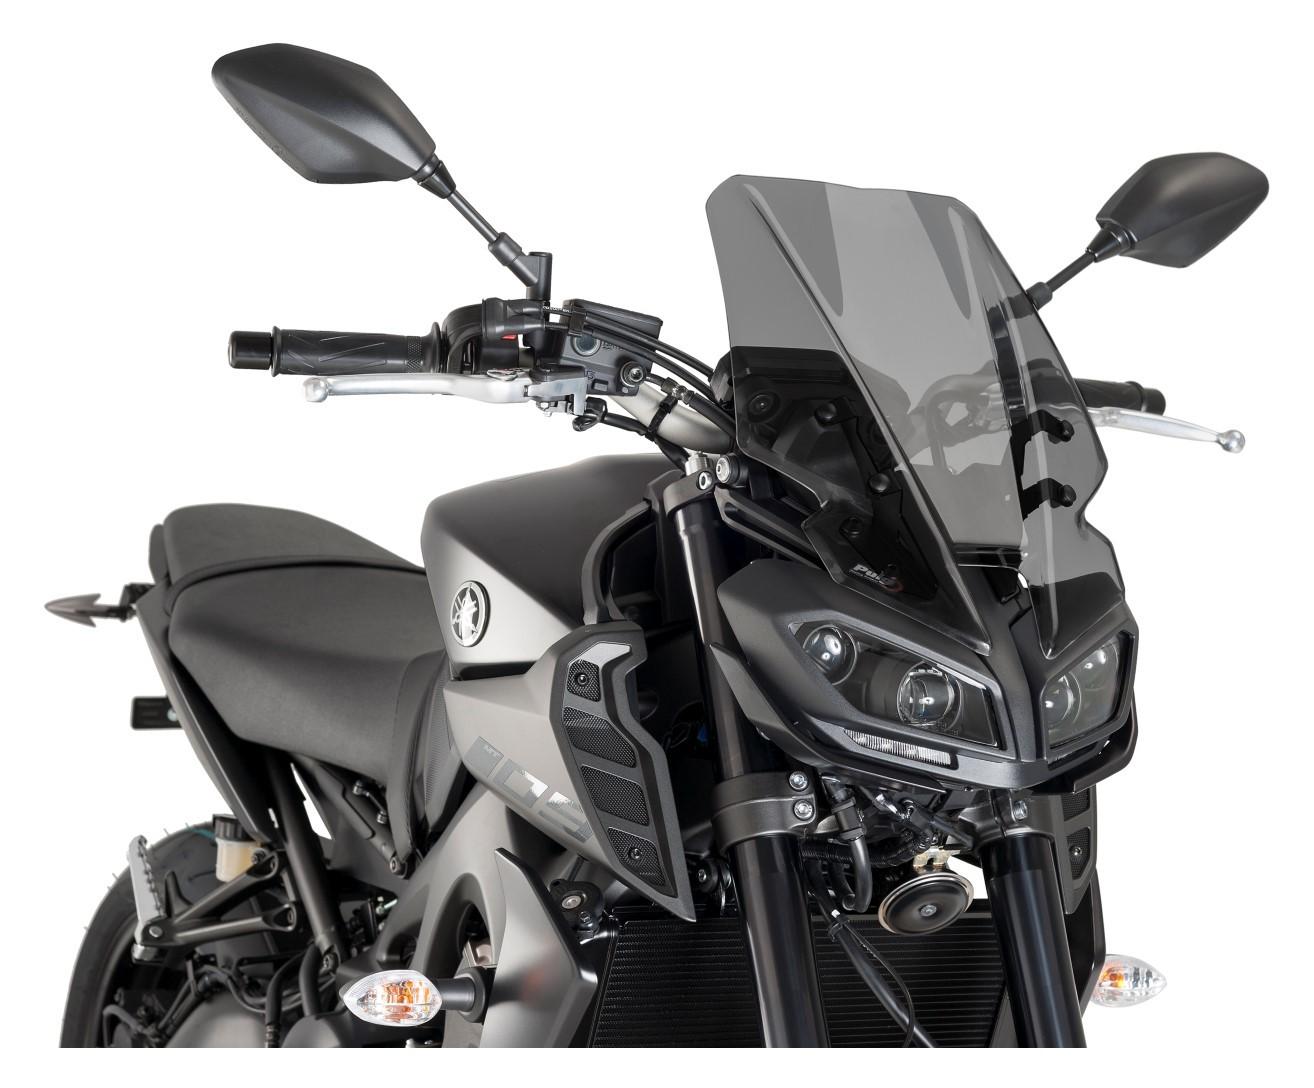 Motorcycle Windscreen Windshield Wind Shield Screen Protector with Bracket For 2017-2018 Yamaha MT-09 FZ-09 MT09 FZ09 Black